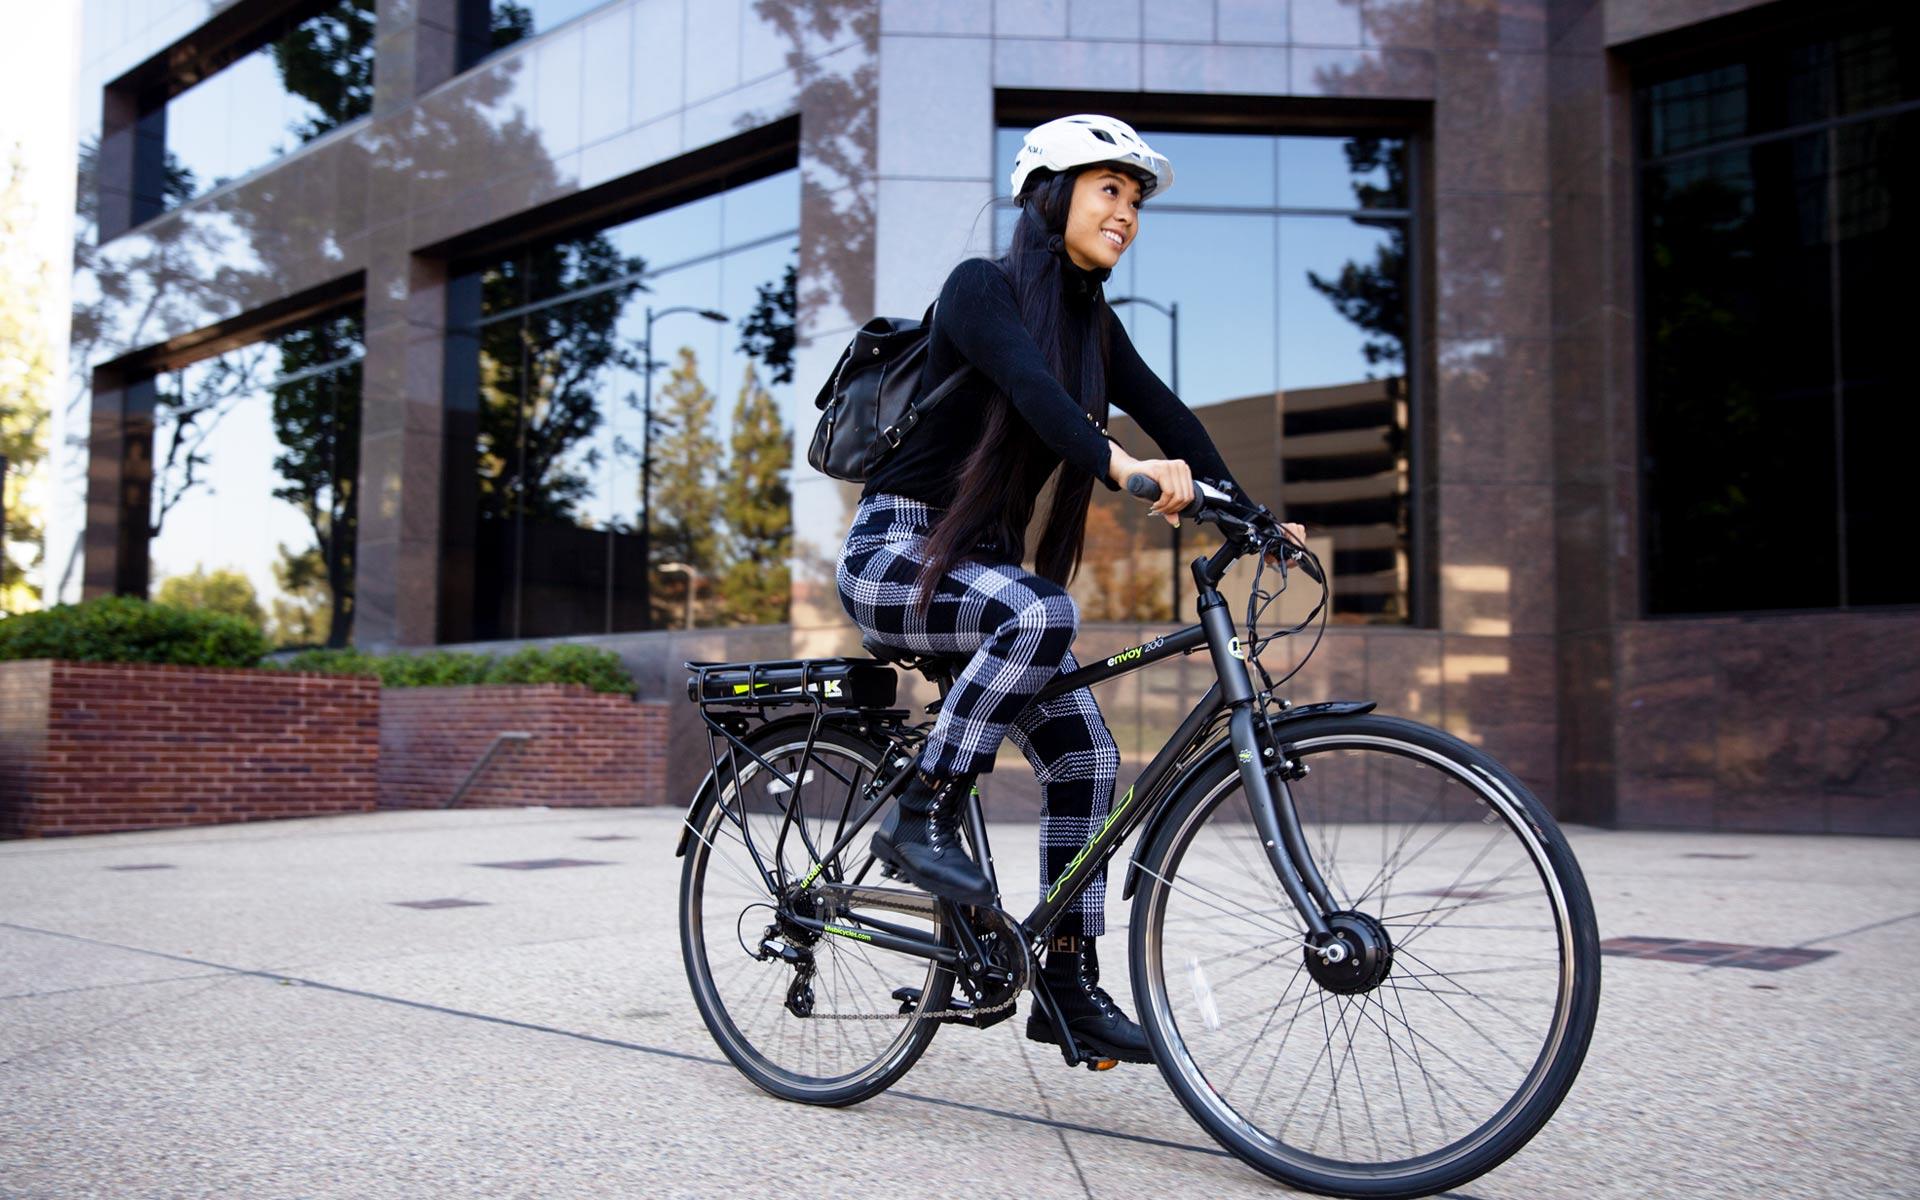 A Rider on the 2020 KHS Envoy 200 e-bike cruising through the city